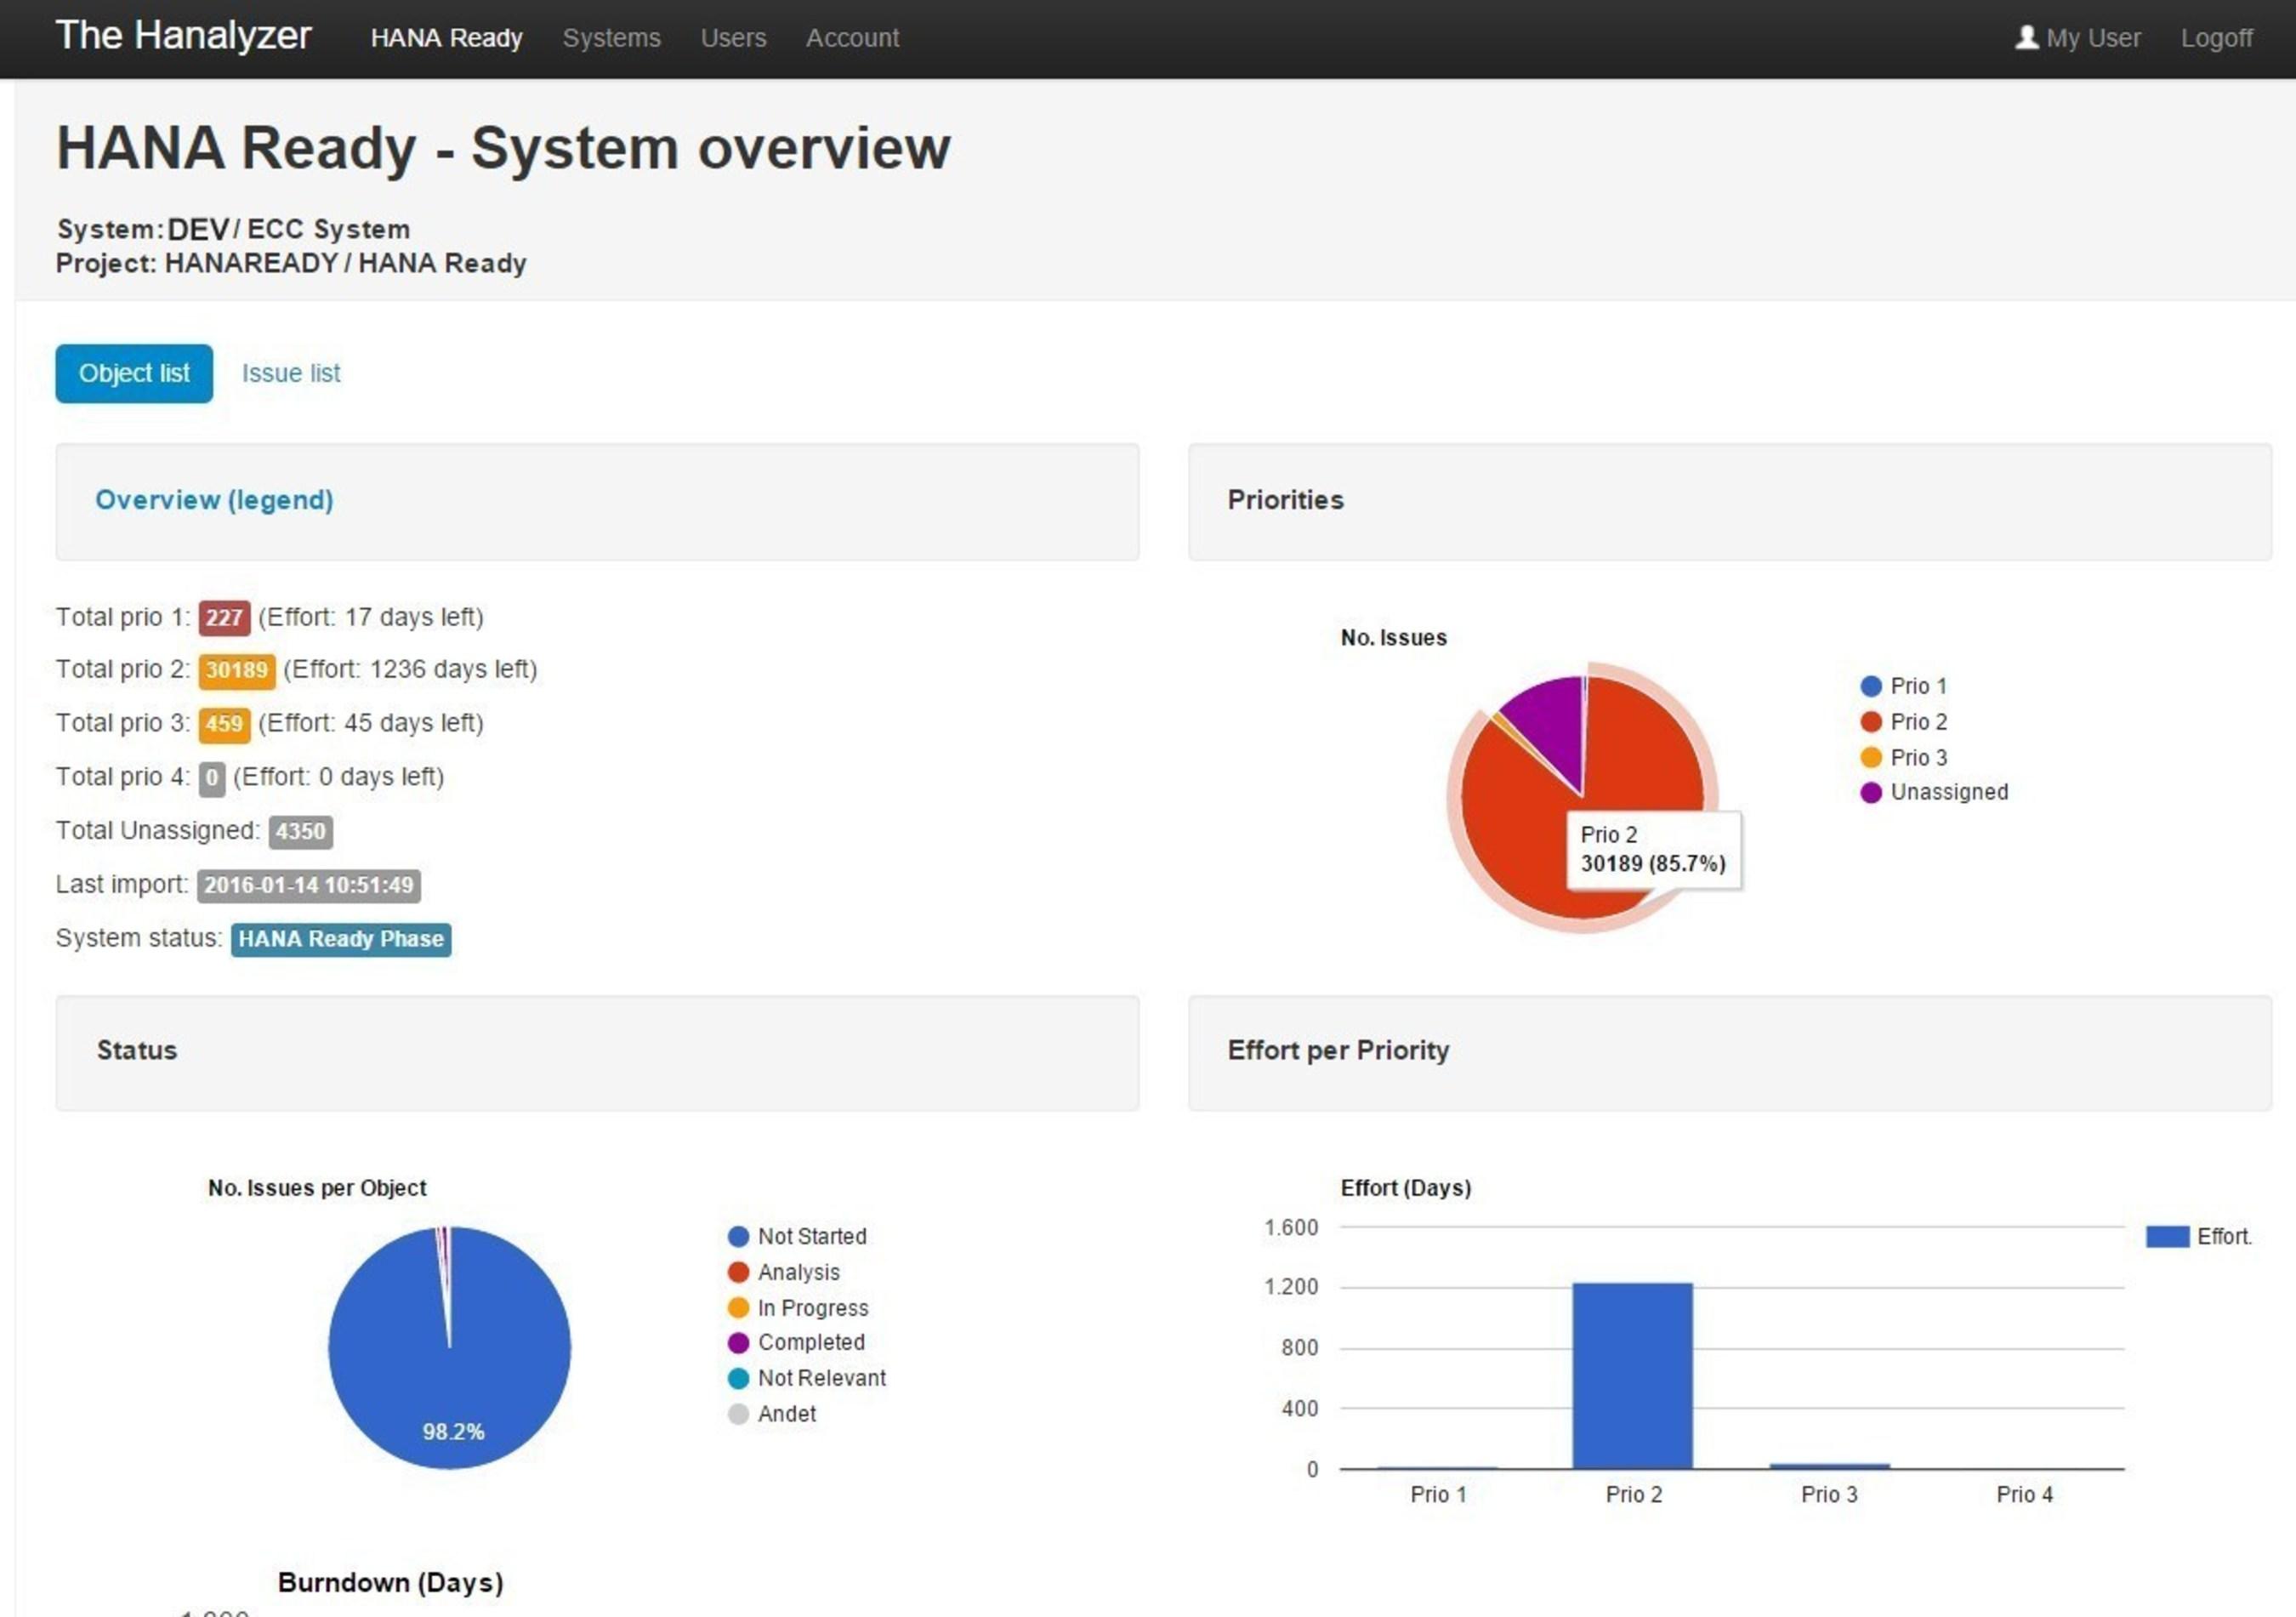 New Cloud-Based Service Helps SAP Users Become HANA Ready